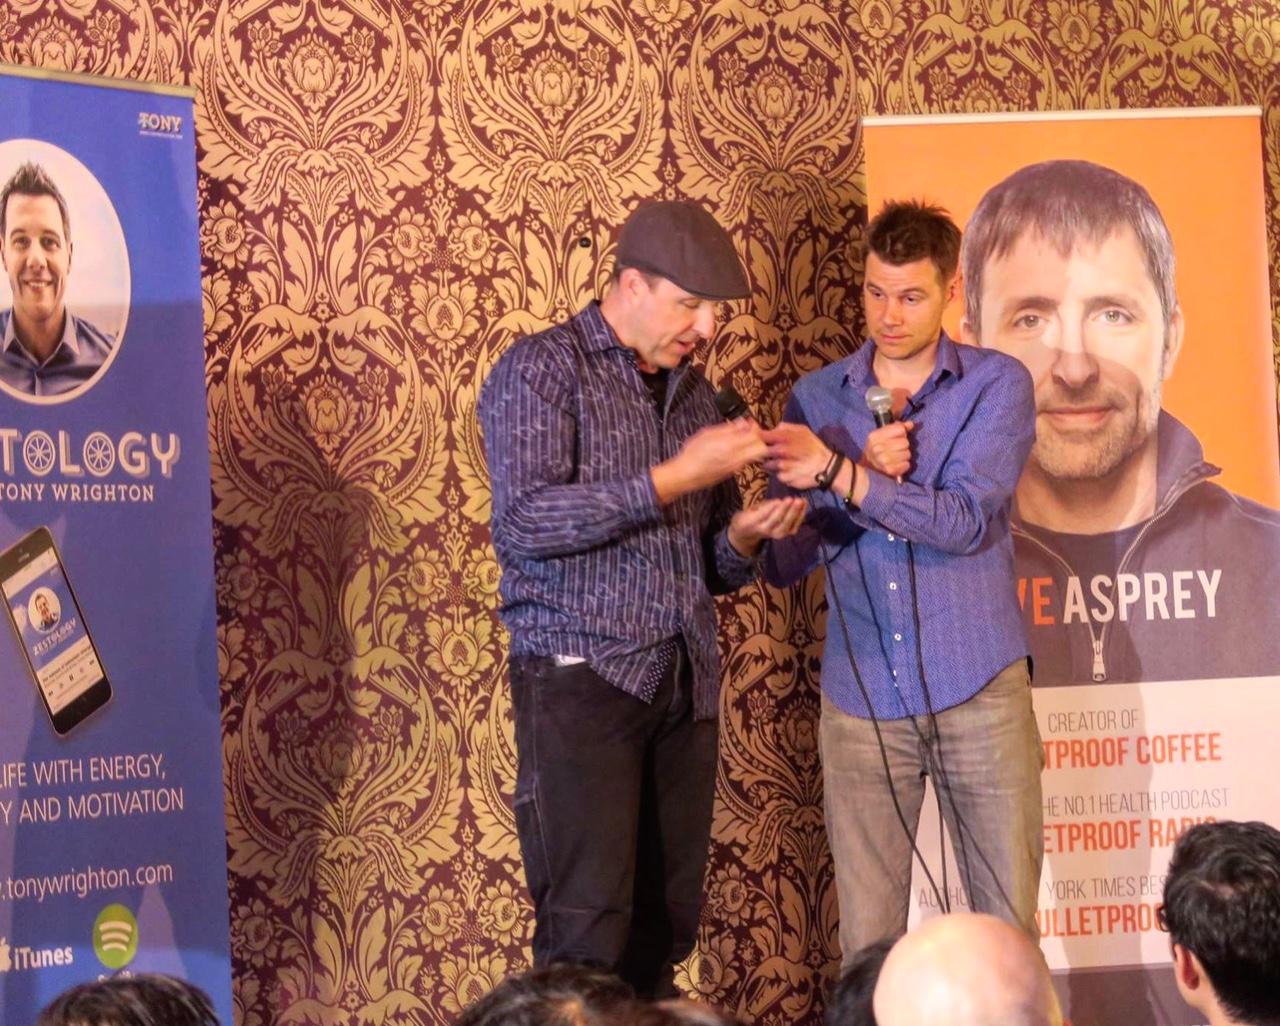 Dave Asprey and Tony Wrighton podcast interview